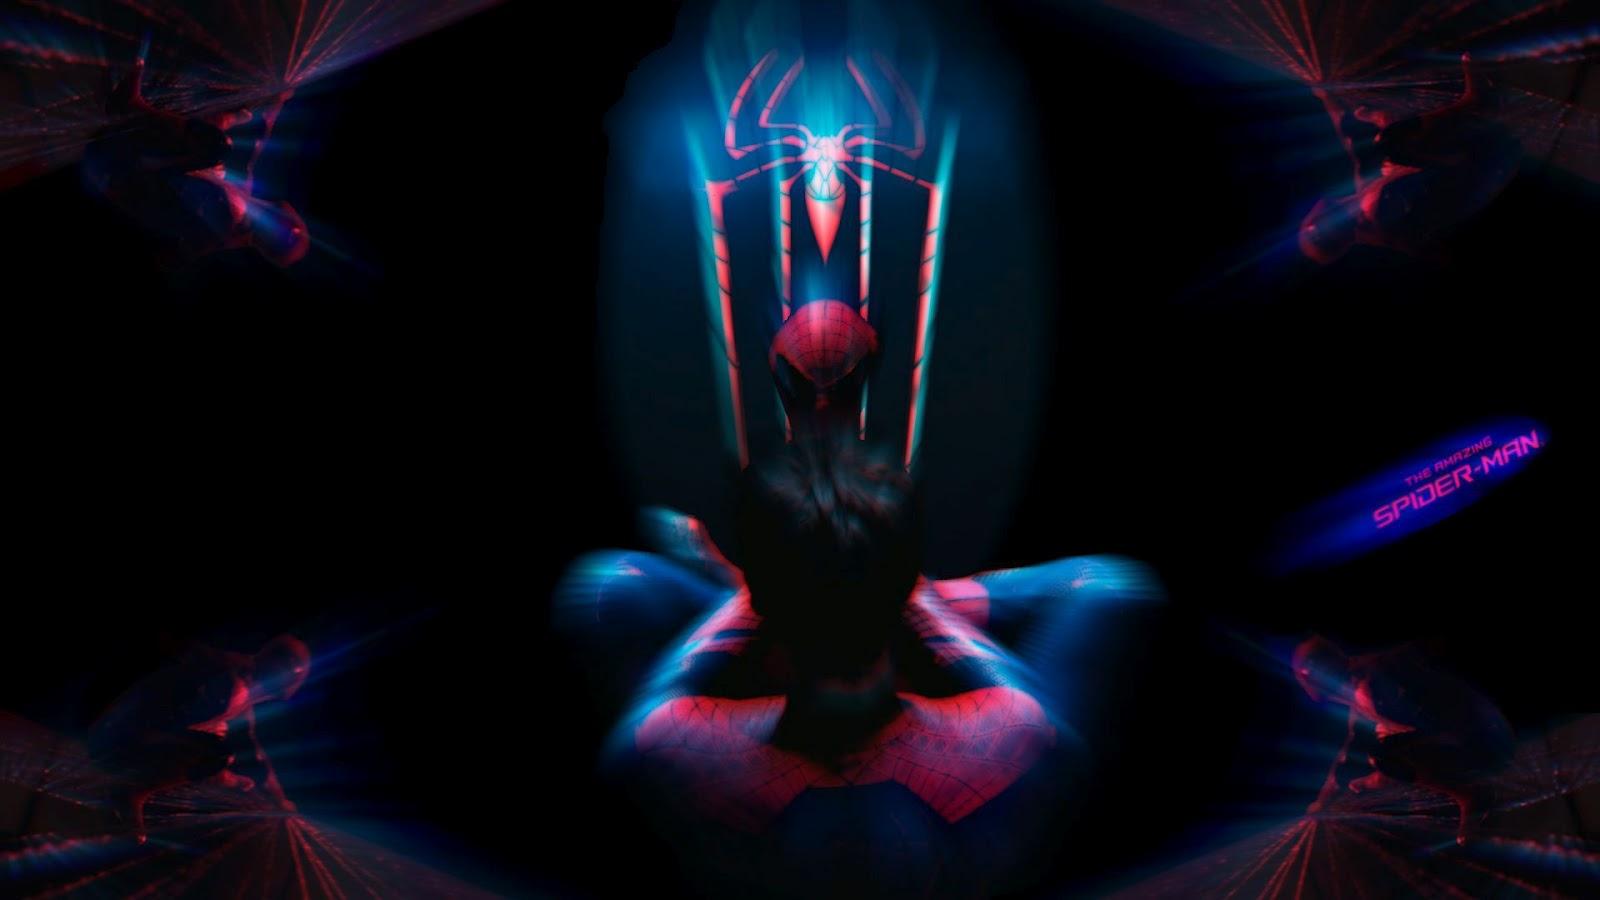 http://1.bp.blogspot.com/-F7bOJB2msfk/T2nQxAS6uYI/AAAAAAAAAZE/UOuSMUdixhU/s1600/Spiderman_2012_2.jpg